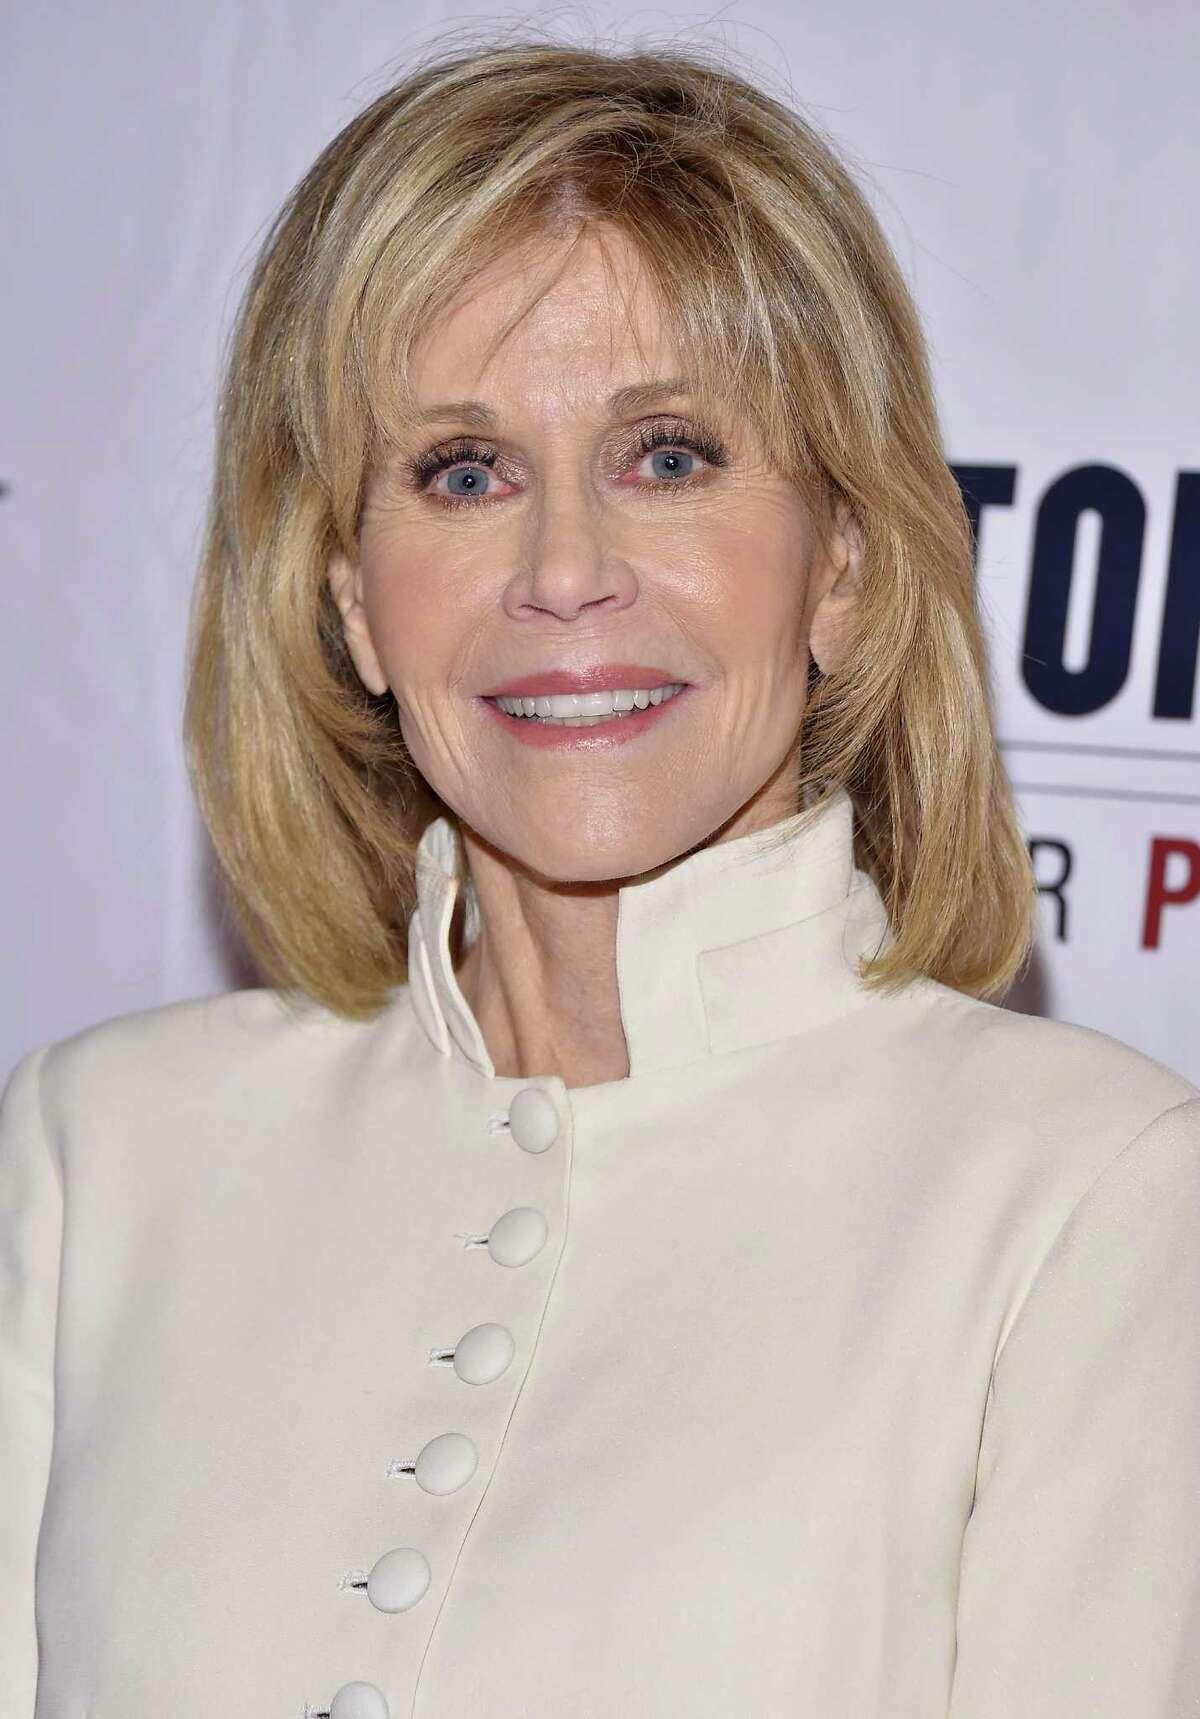 NEW YORK, NY - NOVEMBER 07: Actress Jane Fonda attends Tectonic At 25! at the NYU Skirball Center on November 7, 2016 in New York City. (Photo by Michael Loccisano/Getty Images)